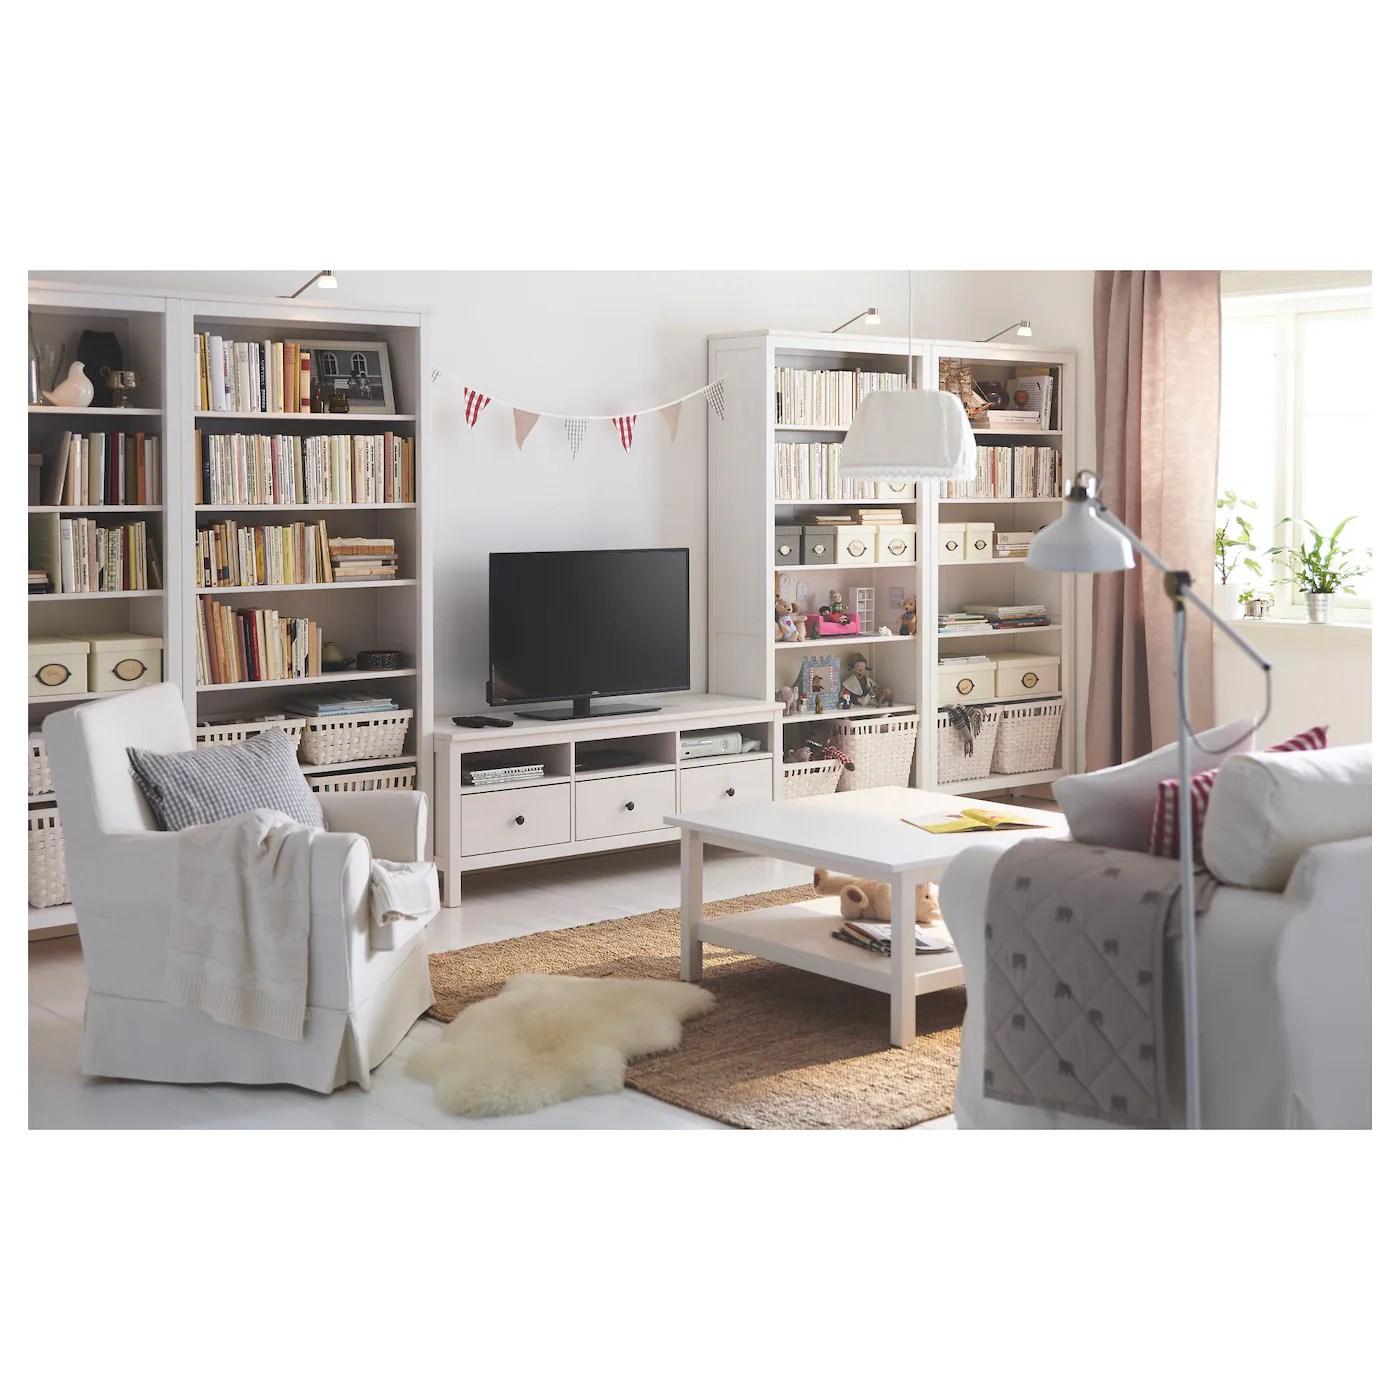 tv chair ikea knoll saarinen hemnes bench white stain 148 x 47 57 cm